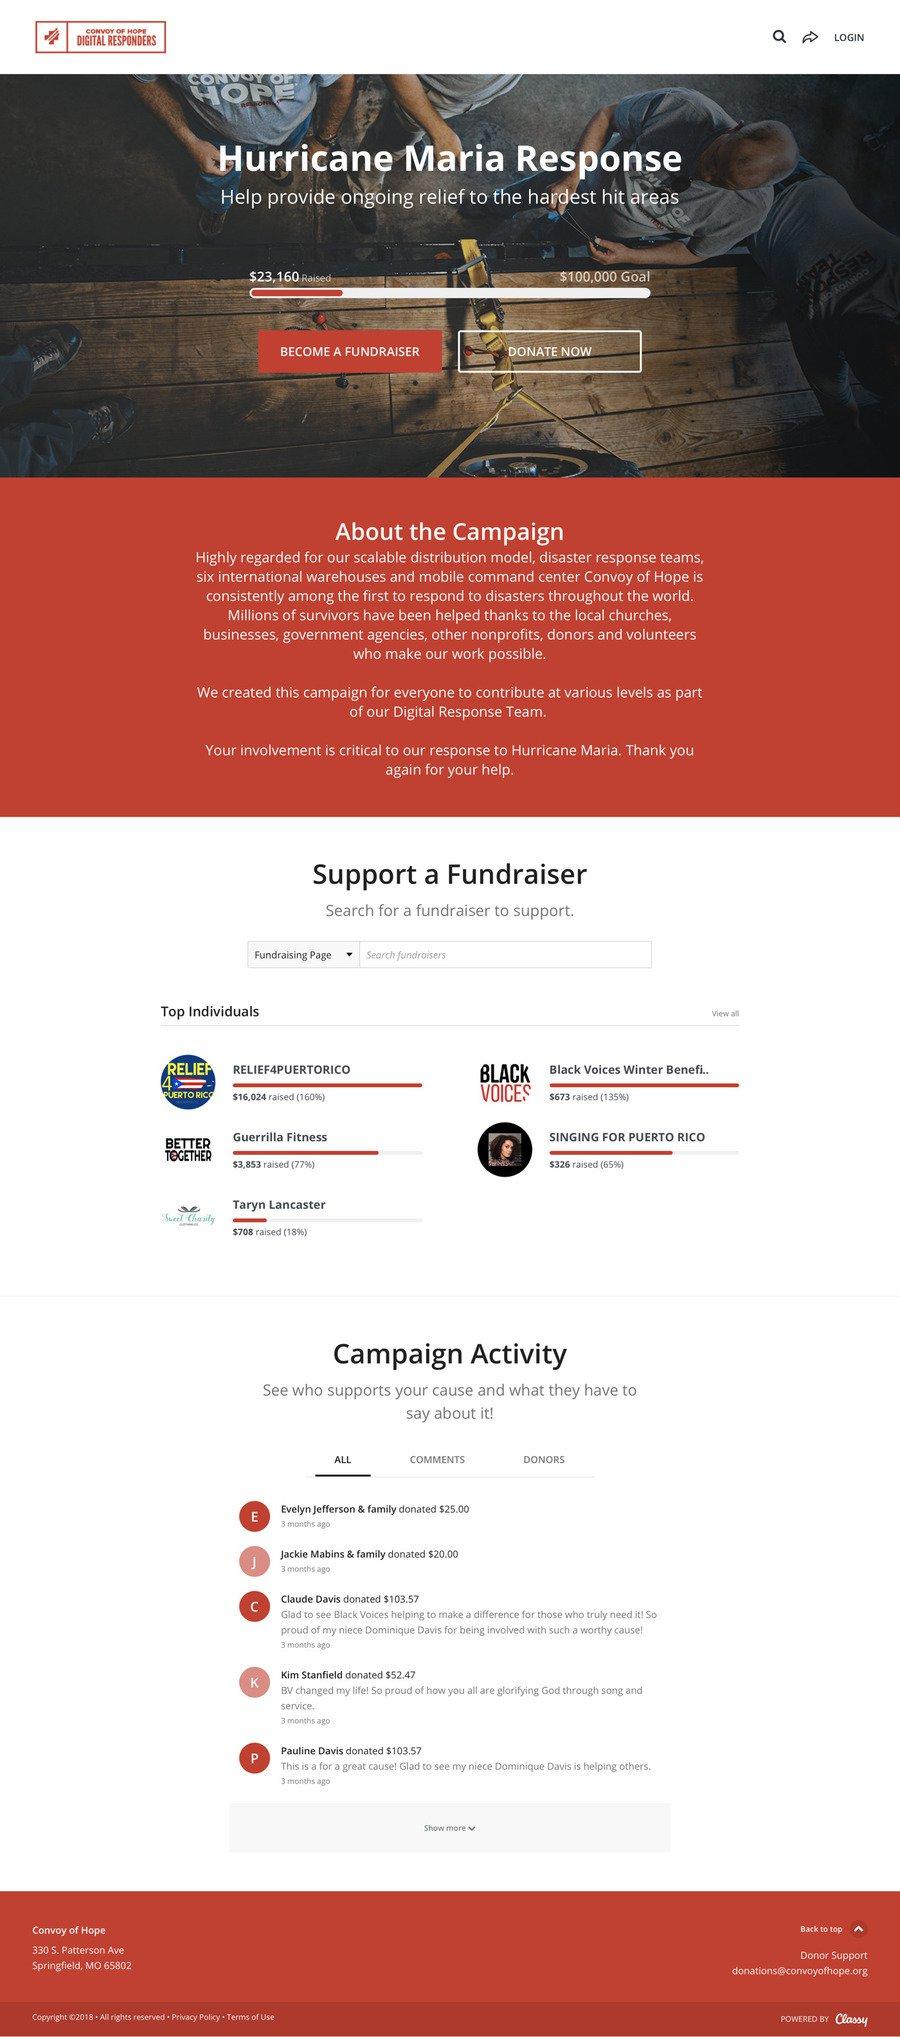 Convoy of Hope Digital Responders: Hurricane Maria , a Peer to Peer campaign on Classy.org